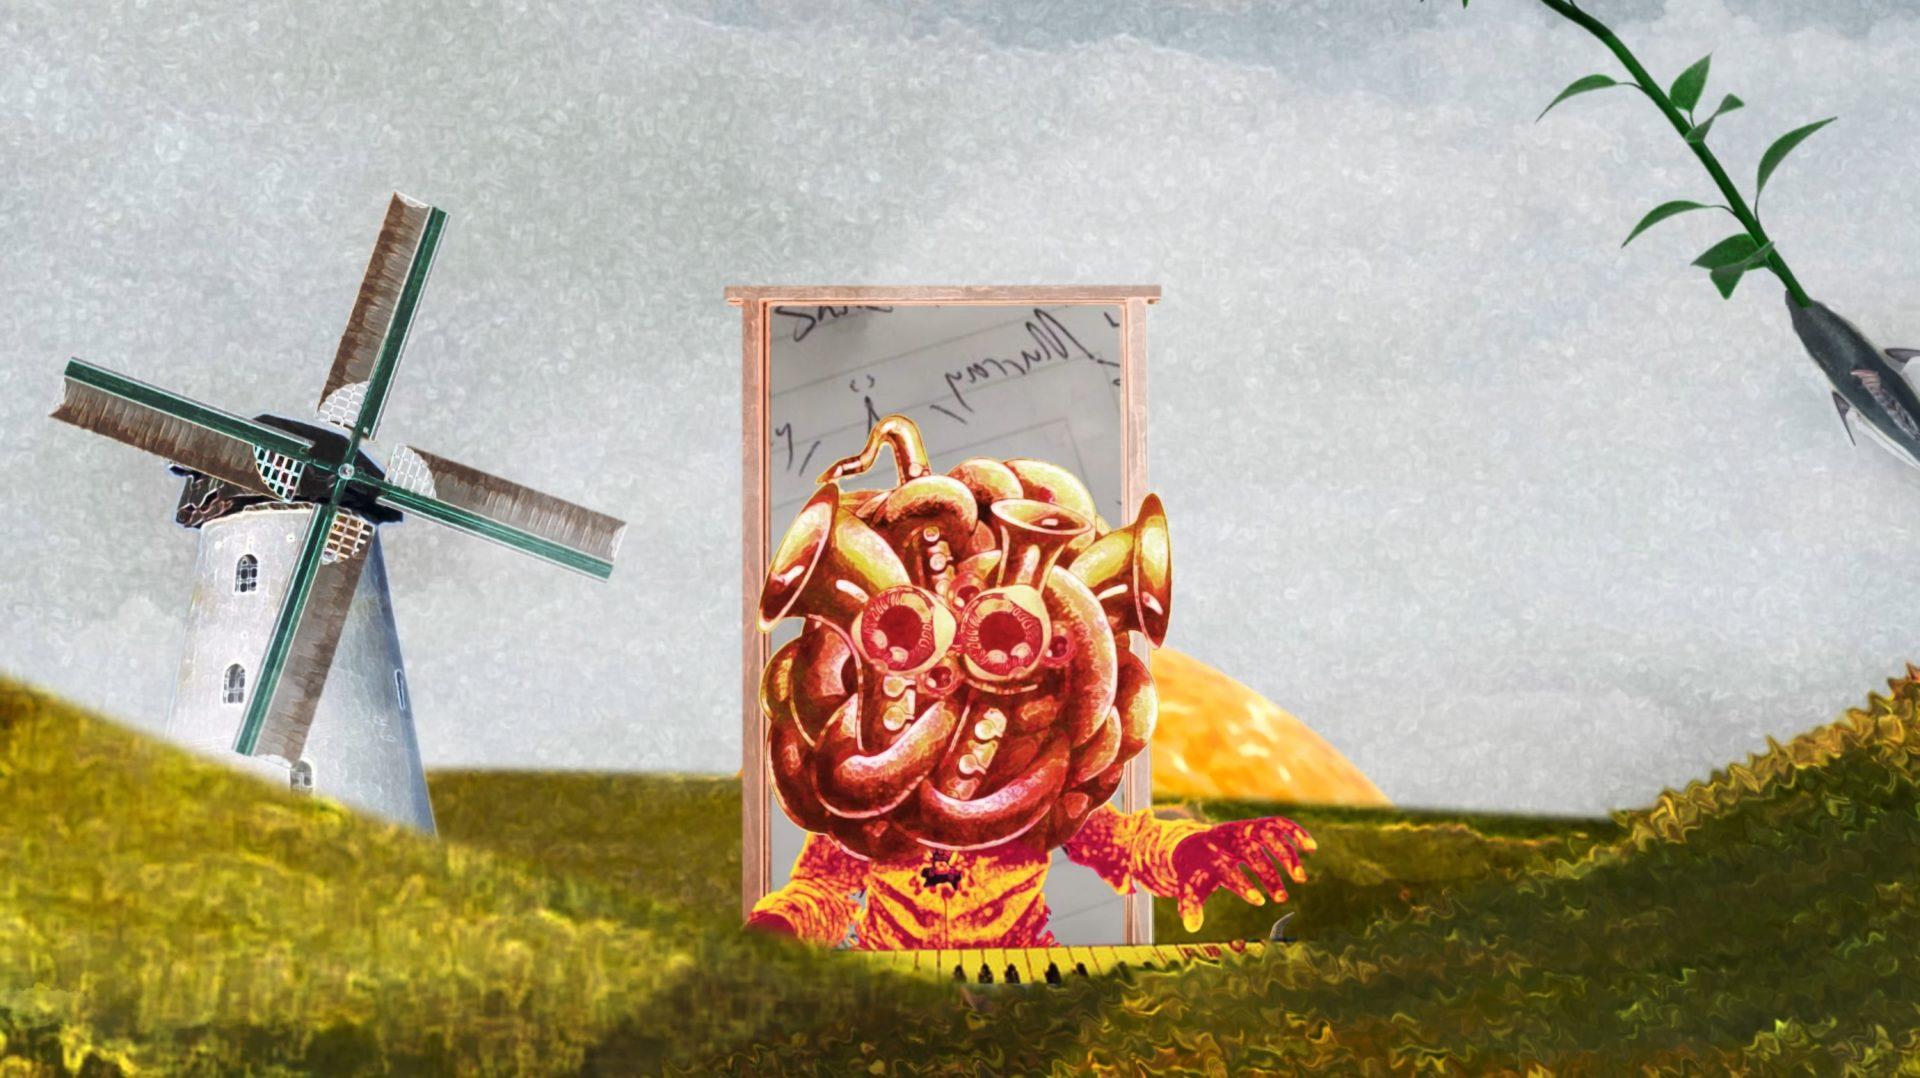 Hybrid Jazz Monsters in Thijsenterprise's 'Another Digital Handshake' Animated Video